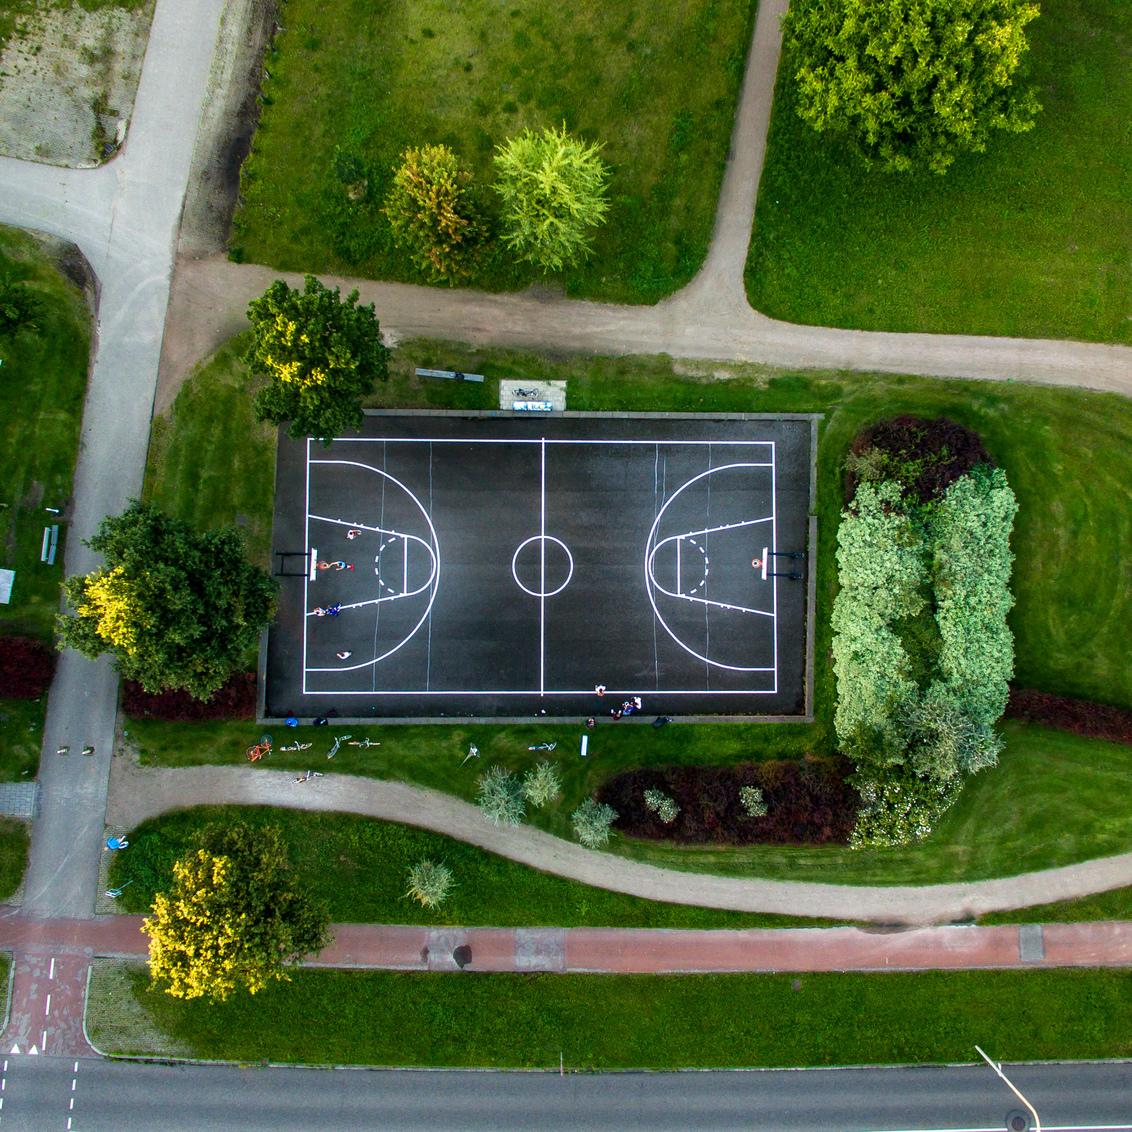 Basketbalveld van Boven